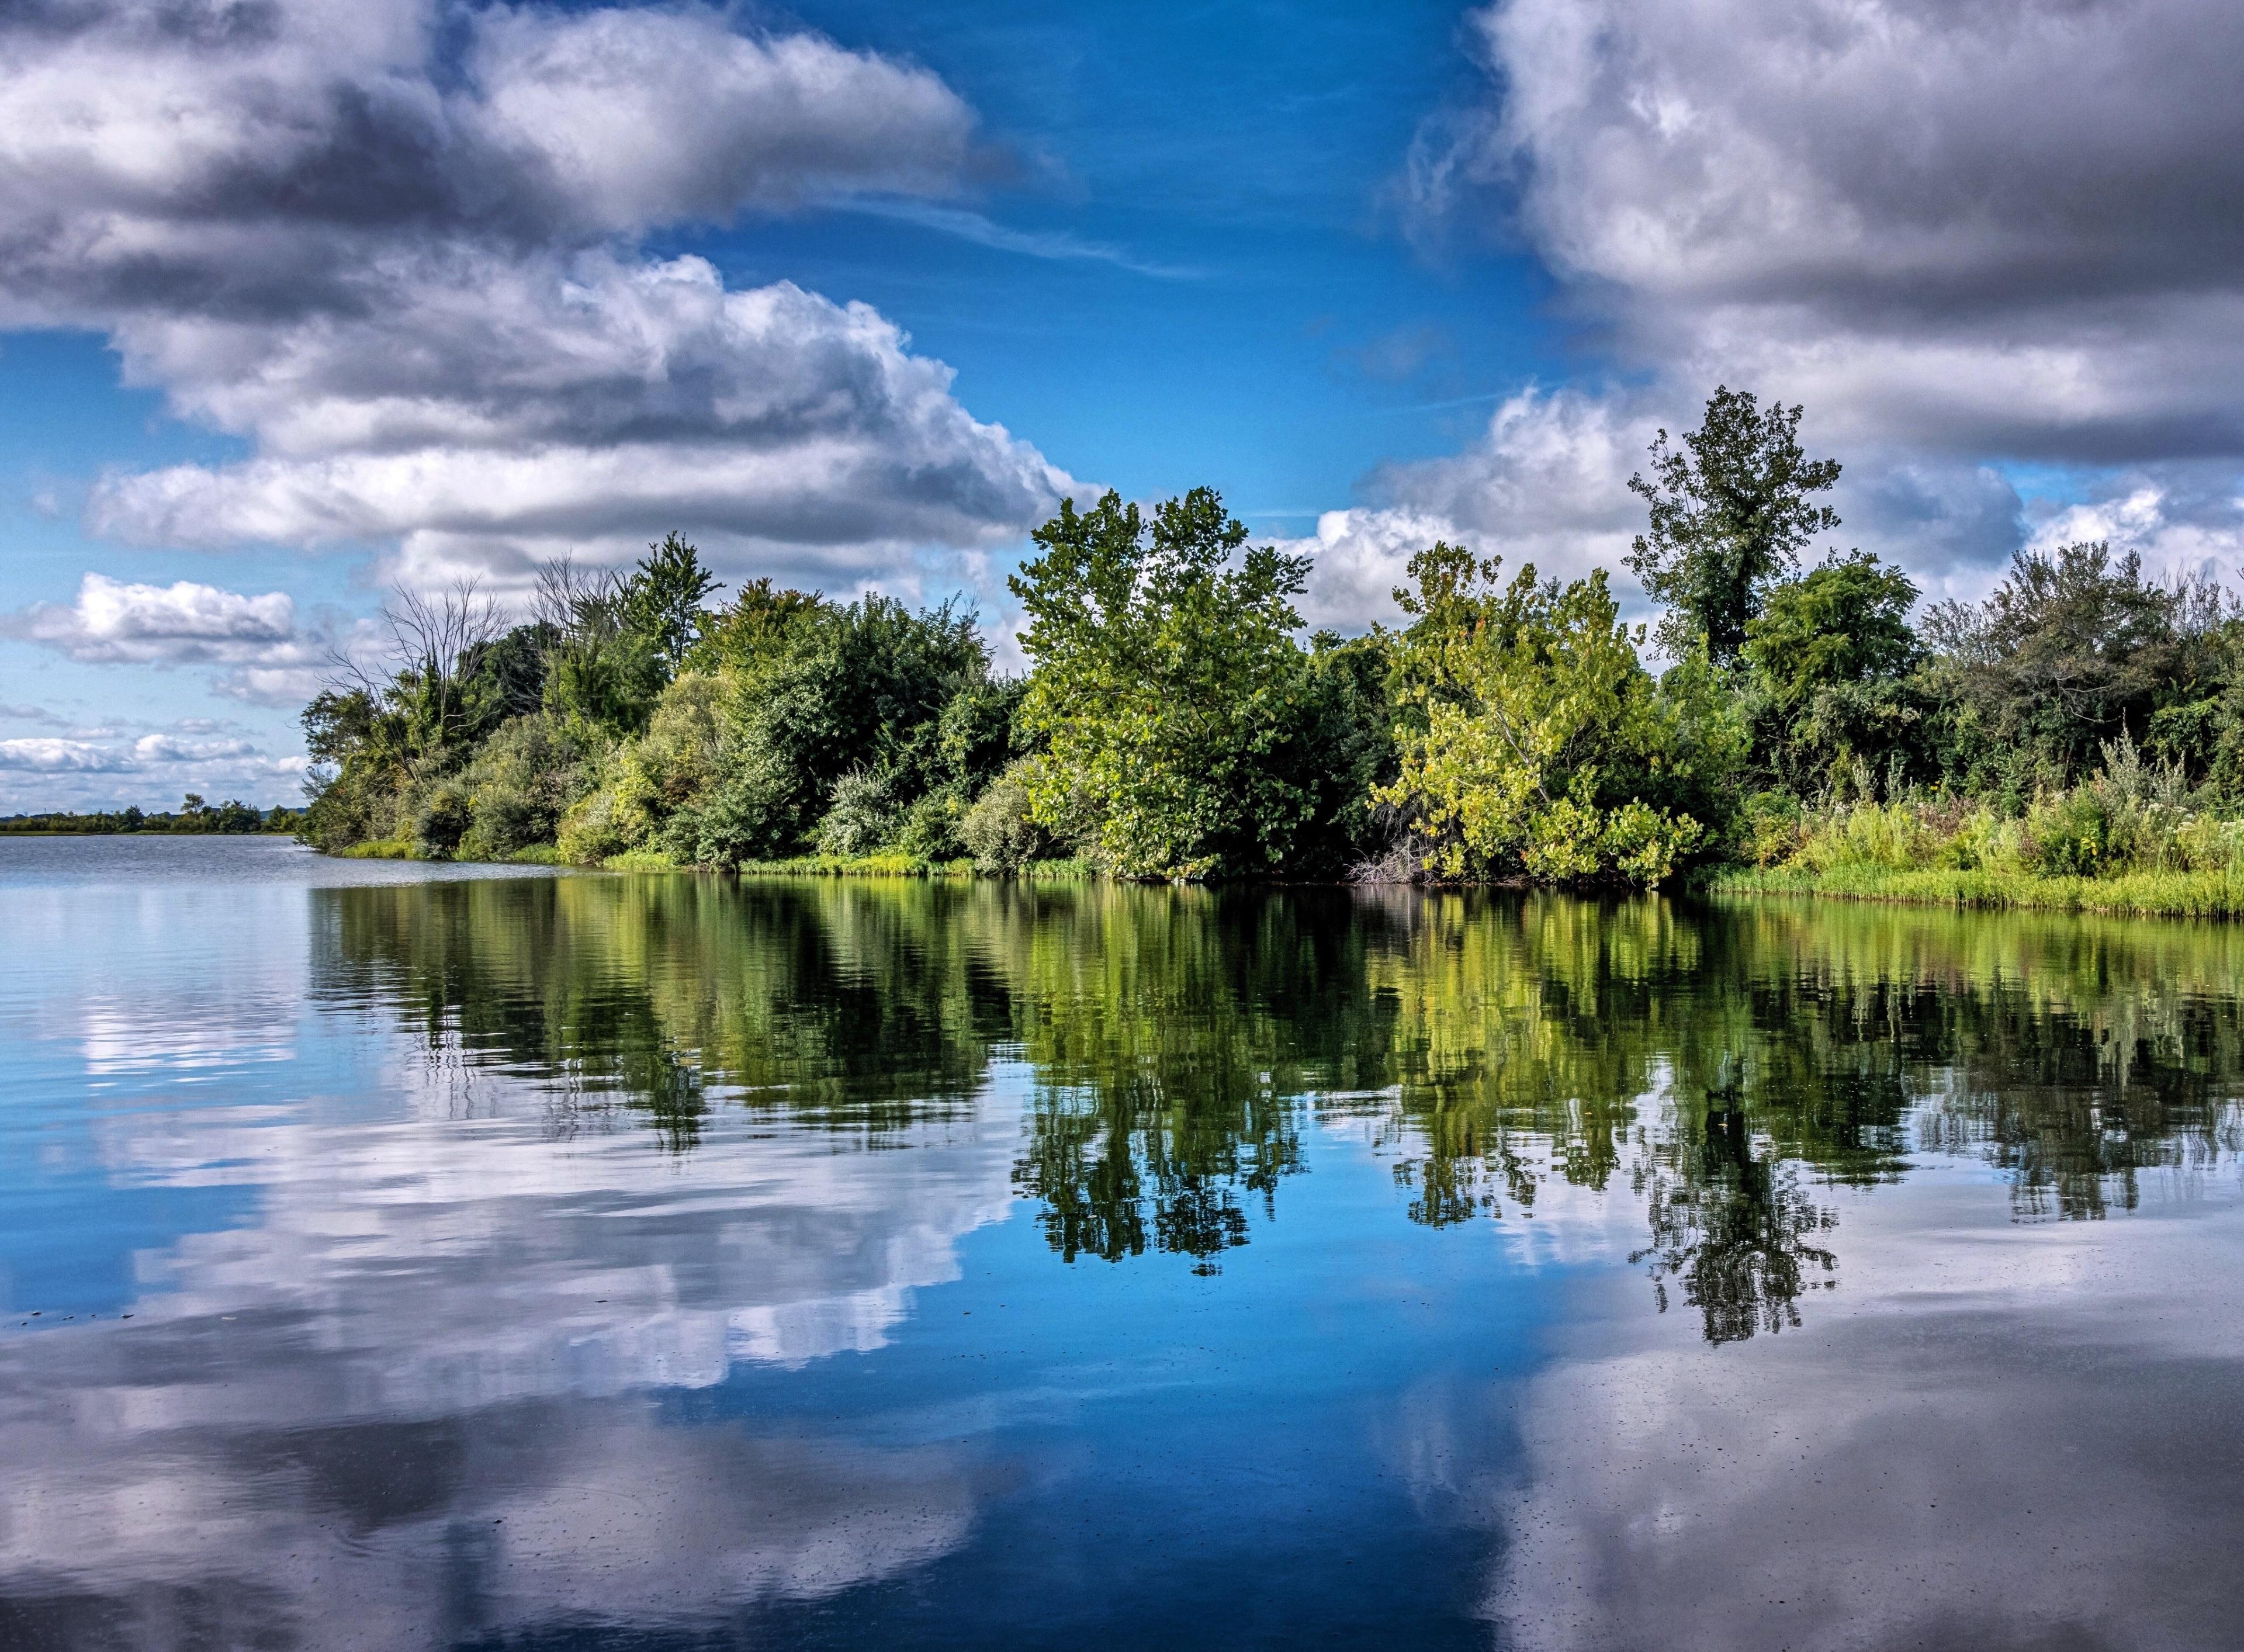 Pike, Indiana, United States of America